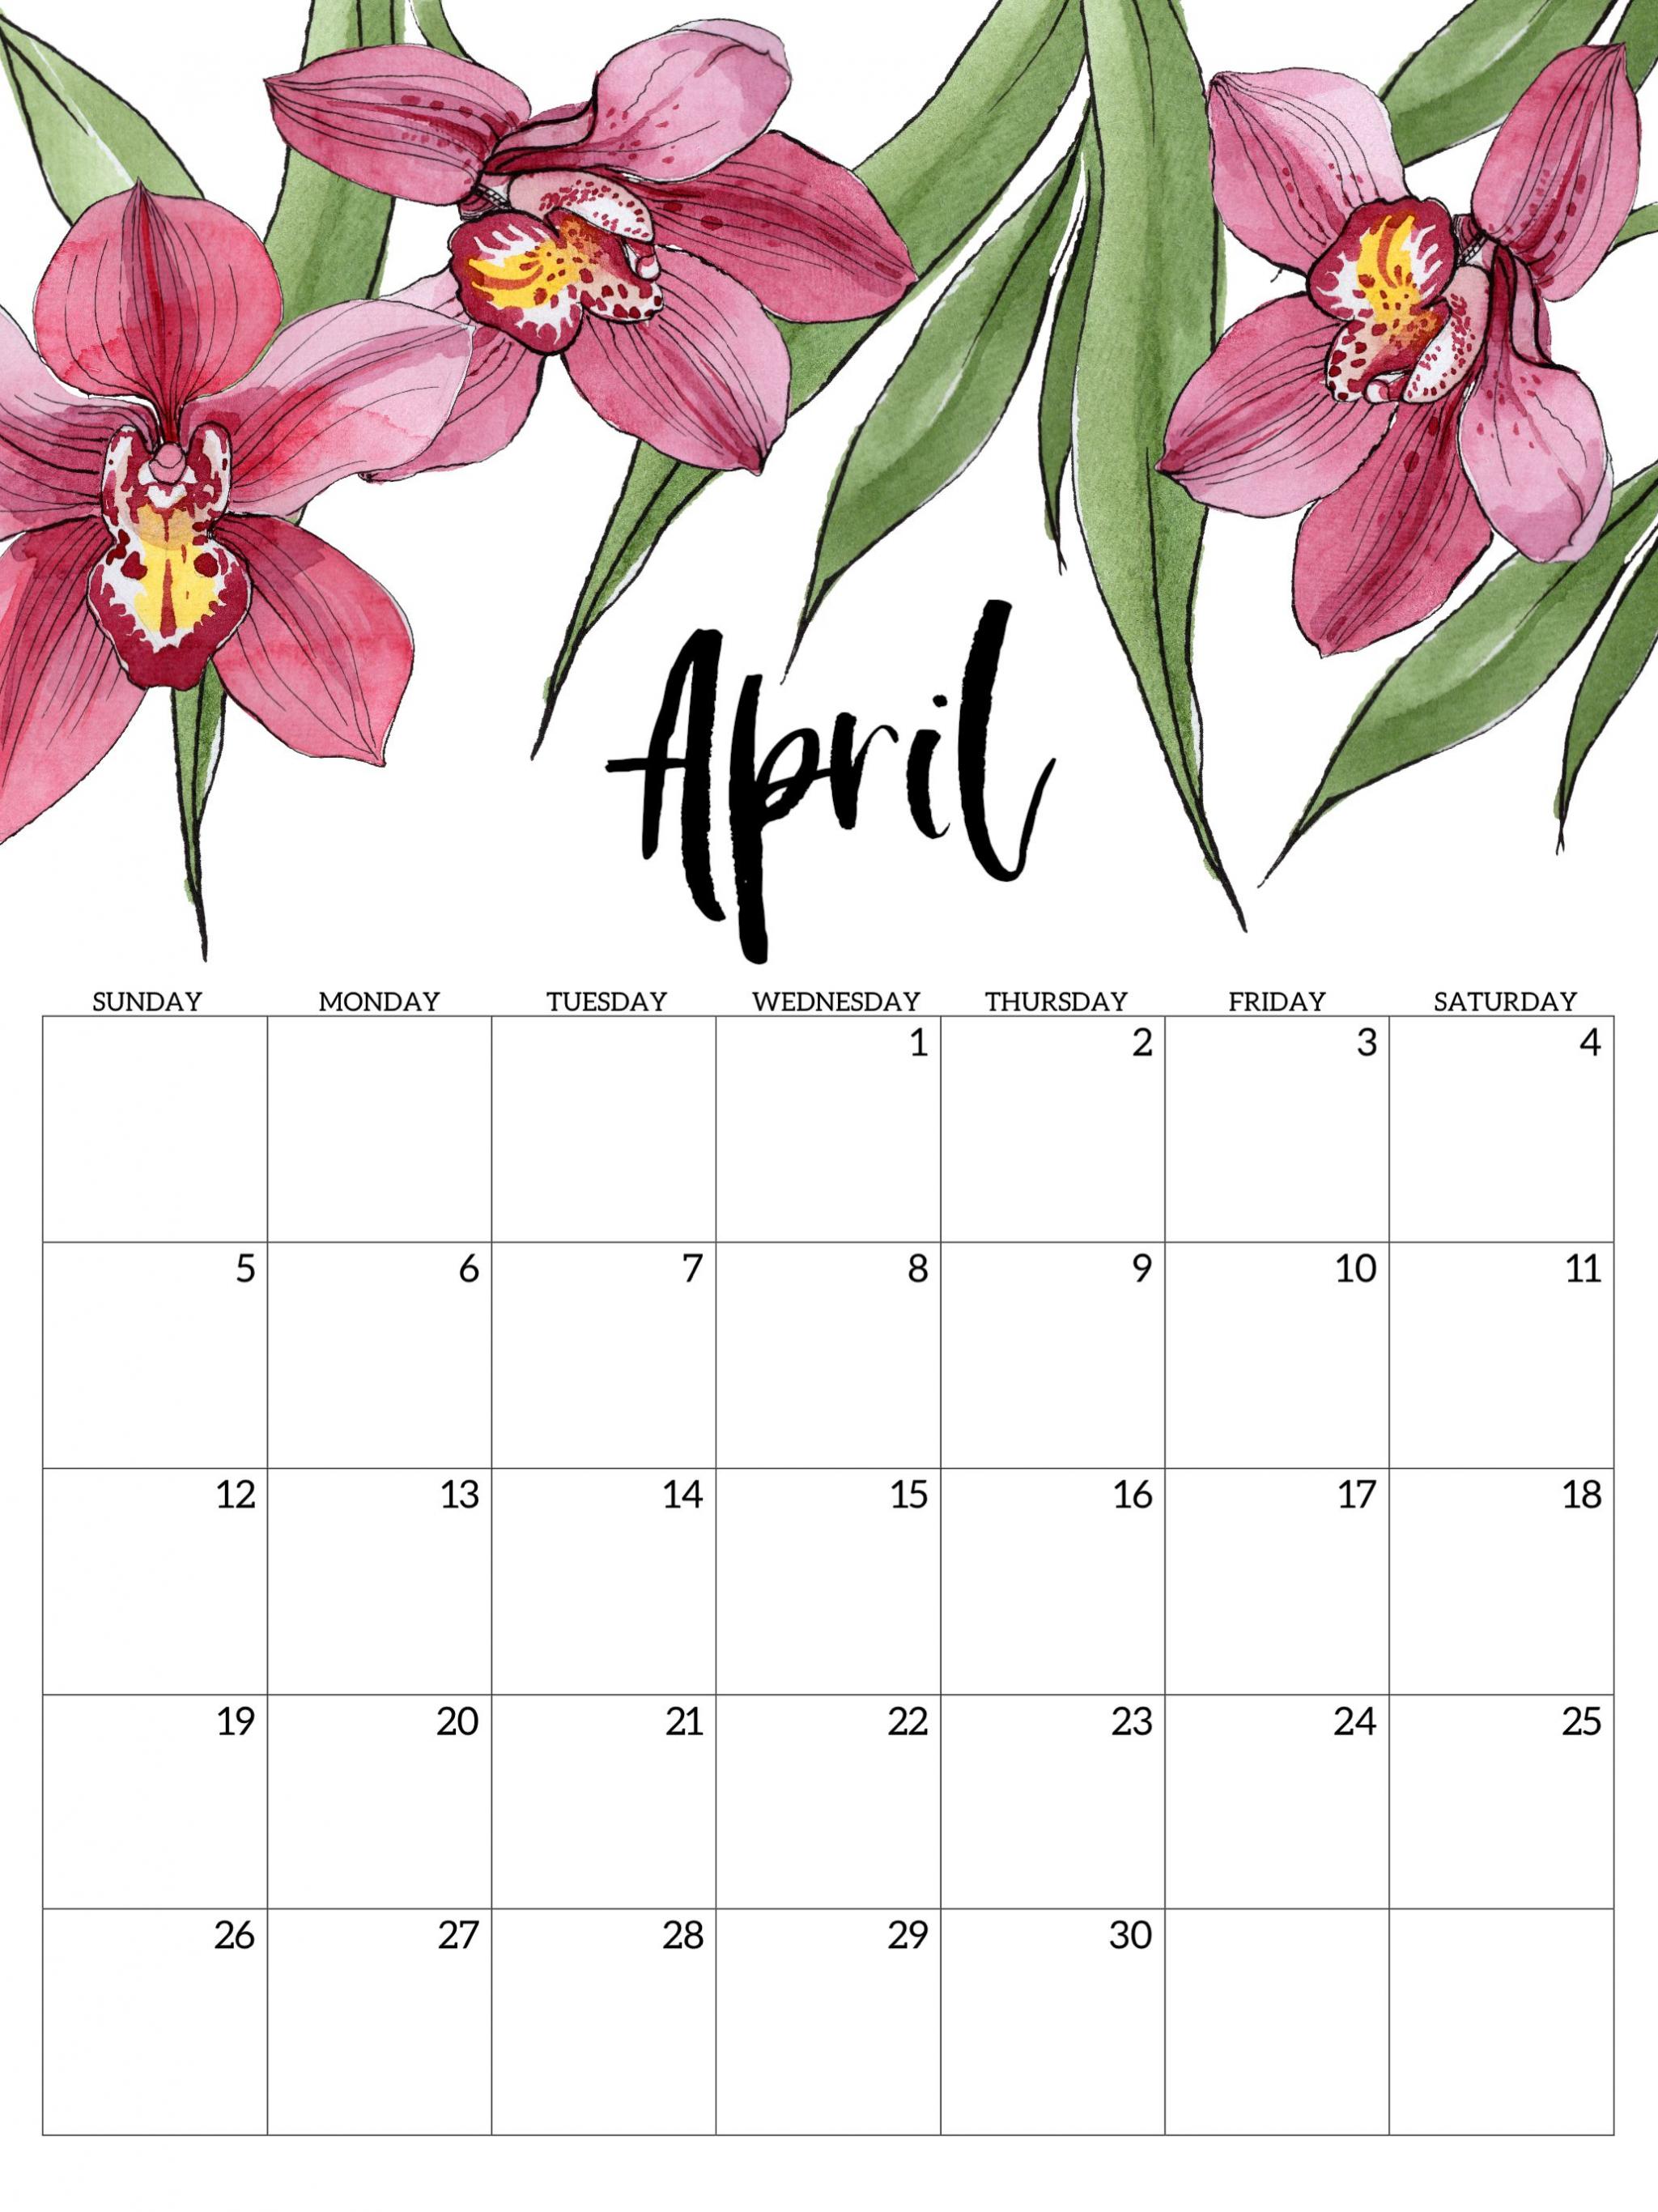 Free Download April 2020 Calendar Wallpapers Top April 2020